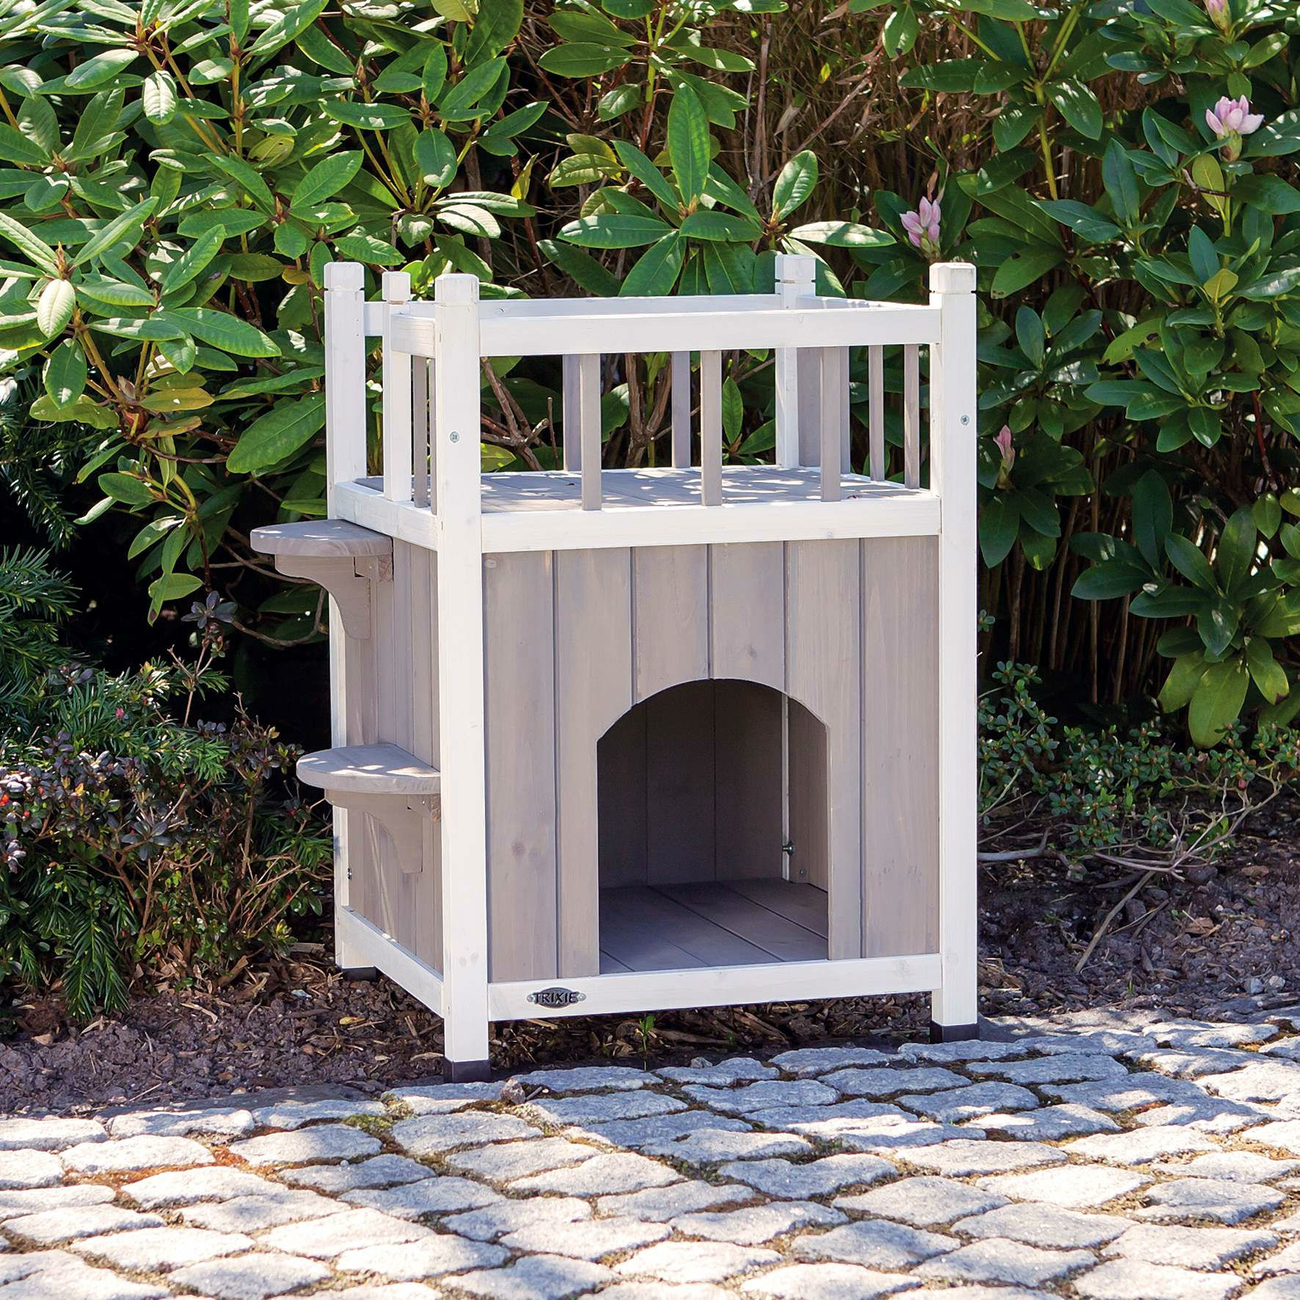 TRIXIE Outdoor Katzenhaus Cat's Home mit Balkon 44093, Bild 2